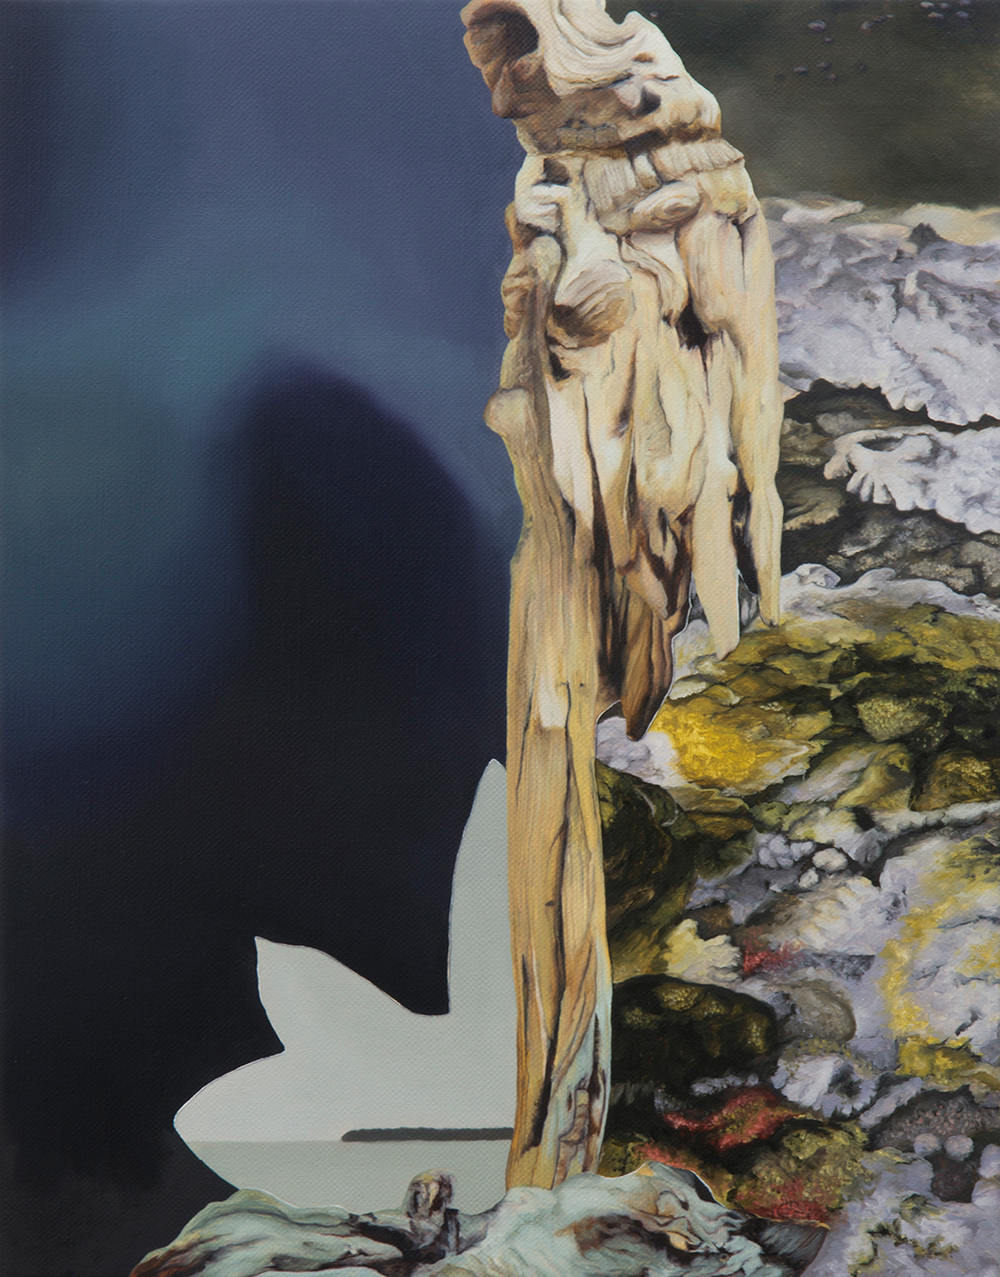 Celestial Driftwood Theme